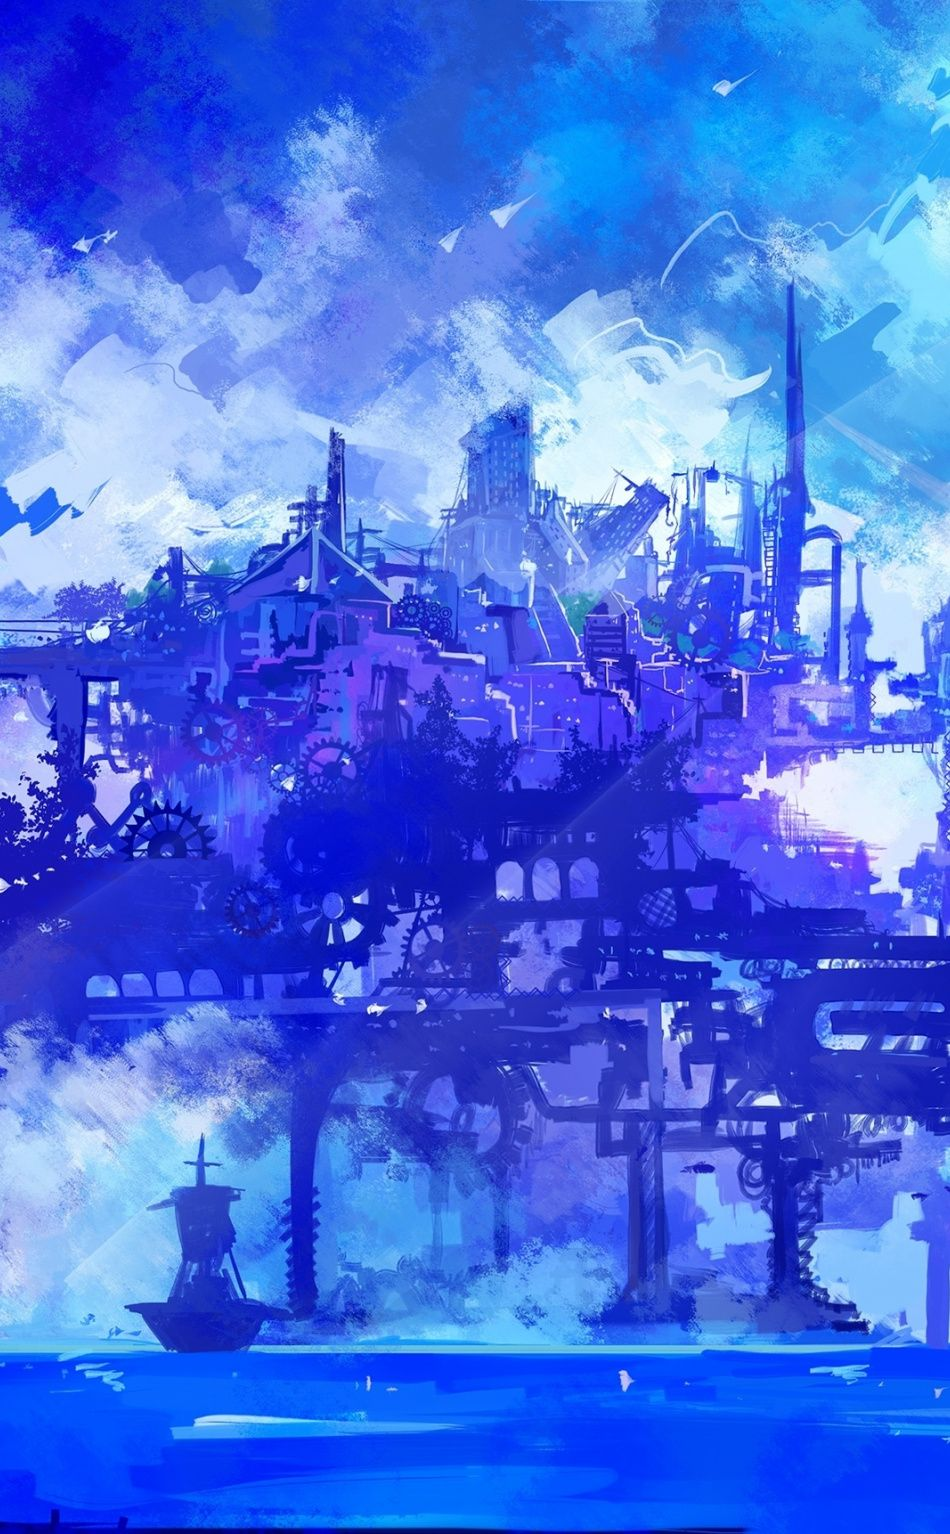 Cyber City Anime Cyberpunk Artwork 950x1534 Wallpaper Cyber City Anime Blue Wallpaper Cyber Anime fantasy mobile wallpapers